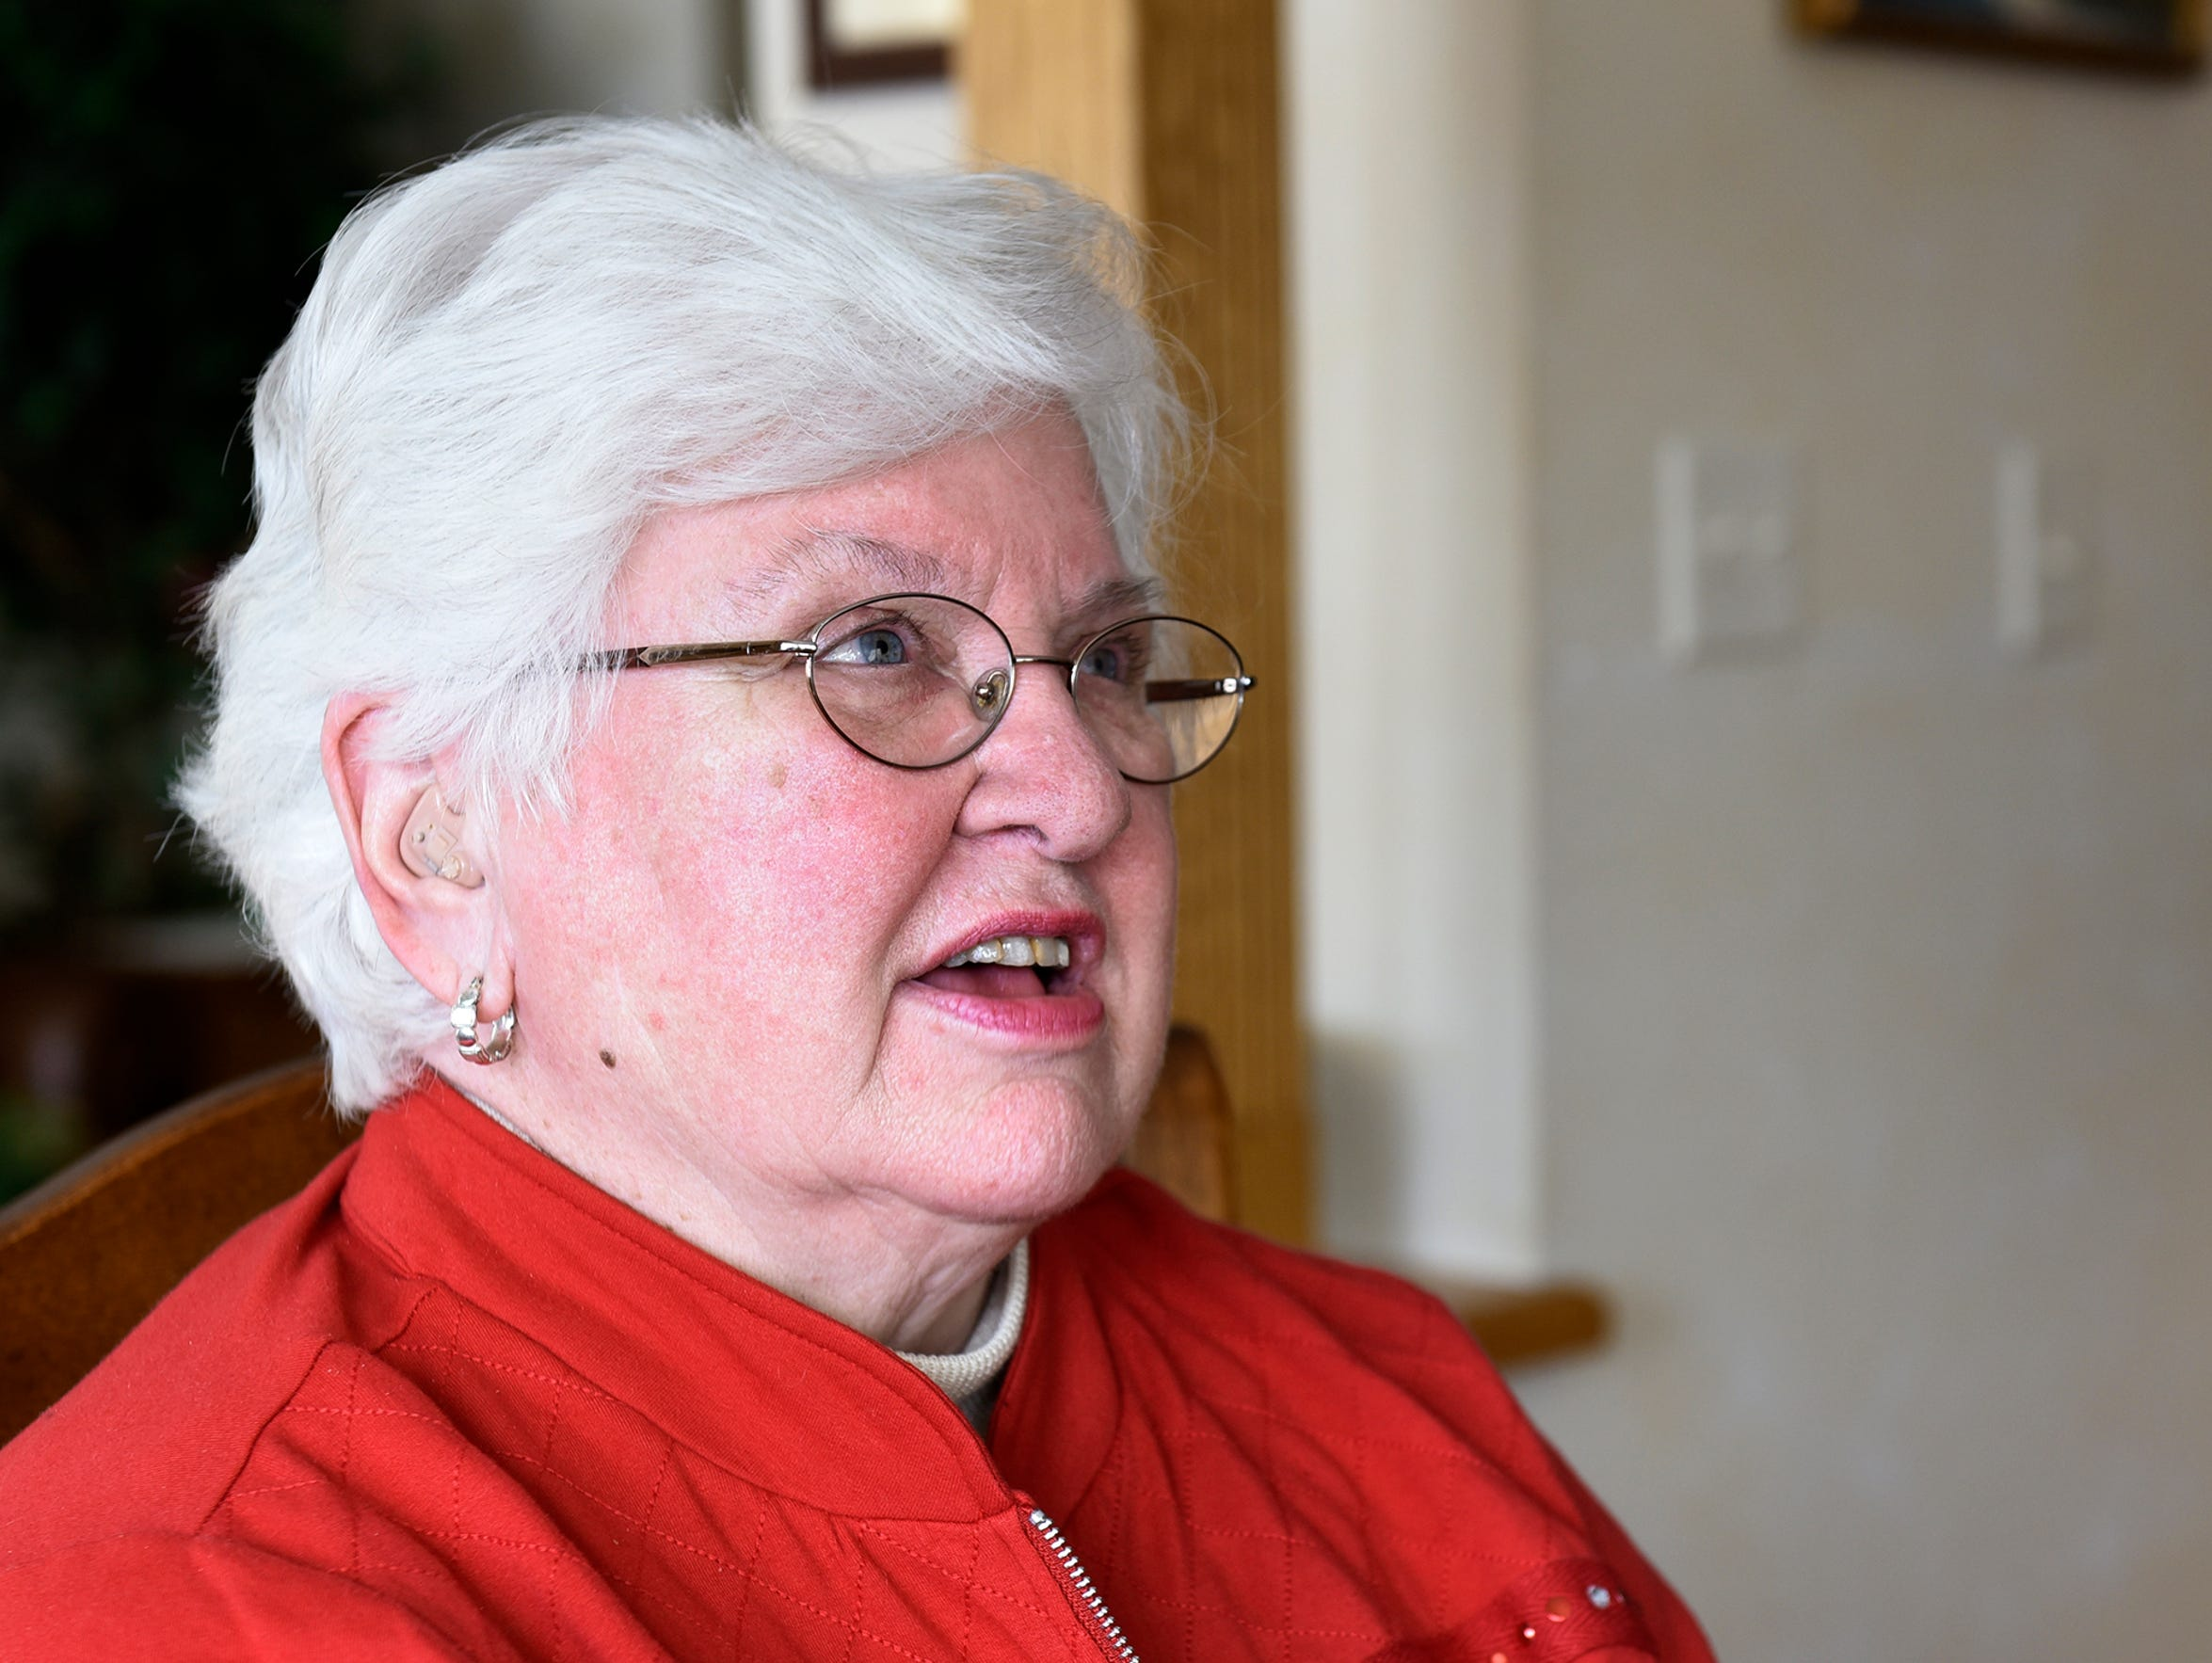 Lois Klinefelter talks about her son Brian during an